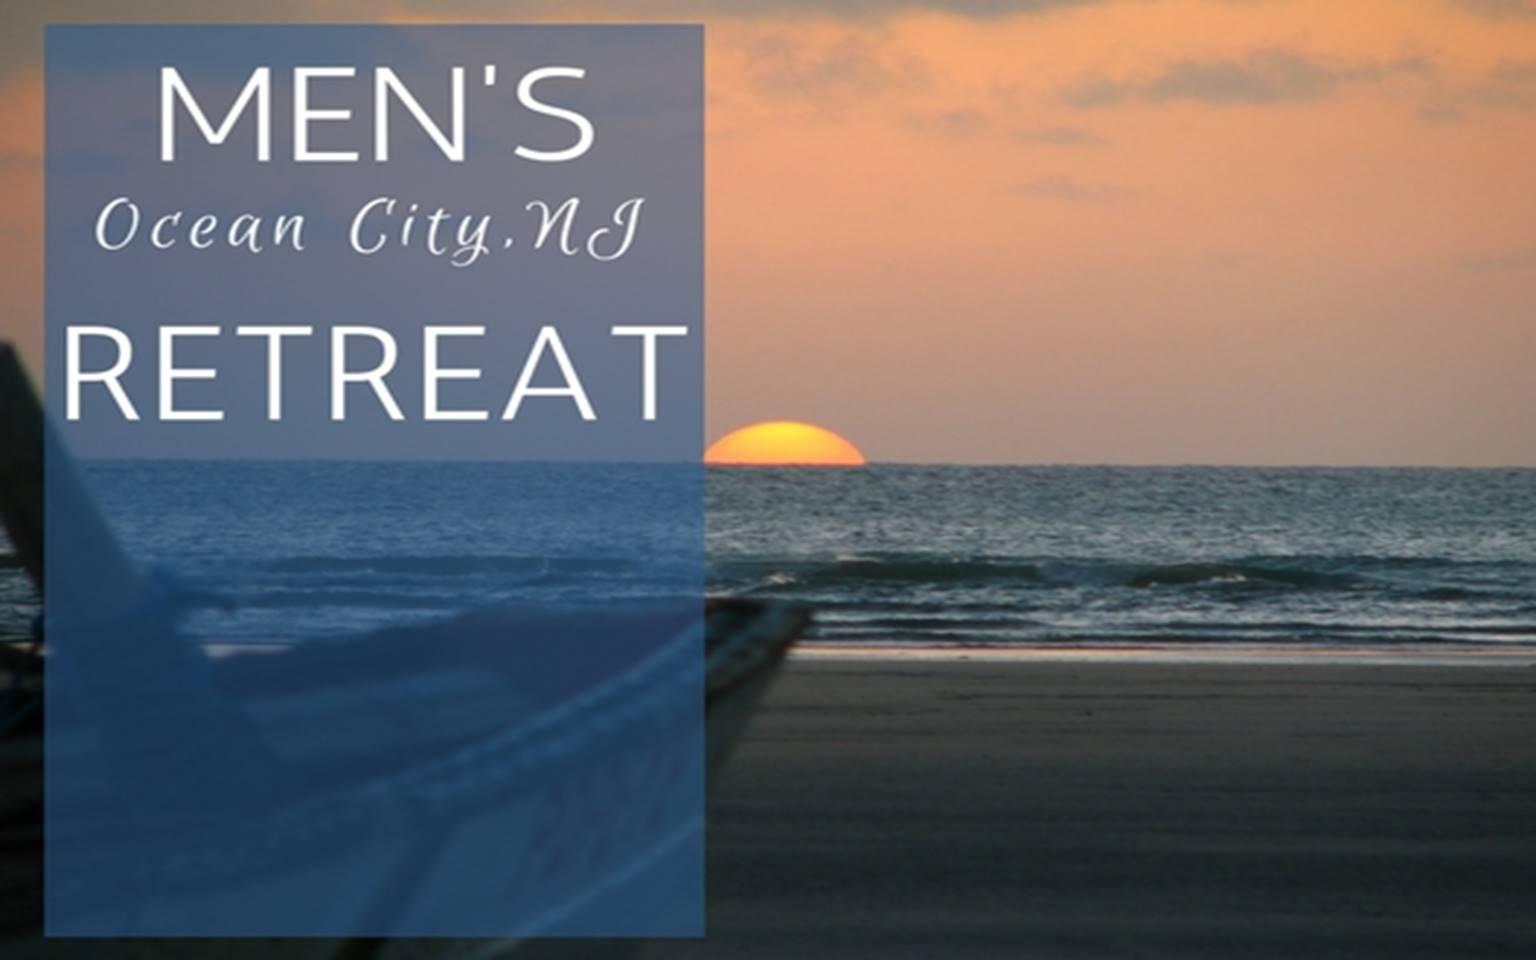 Men's Ocean City, NJ Retreat logo